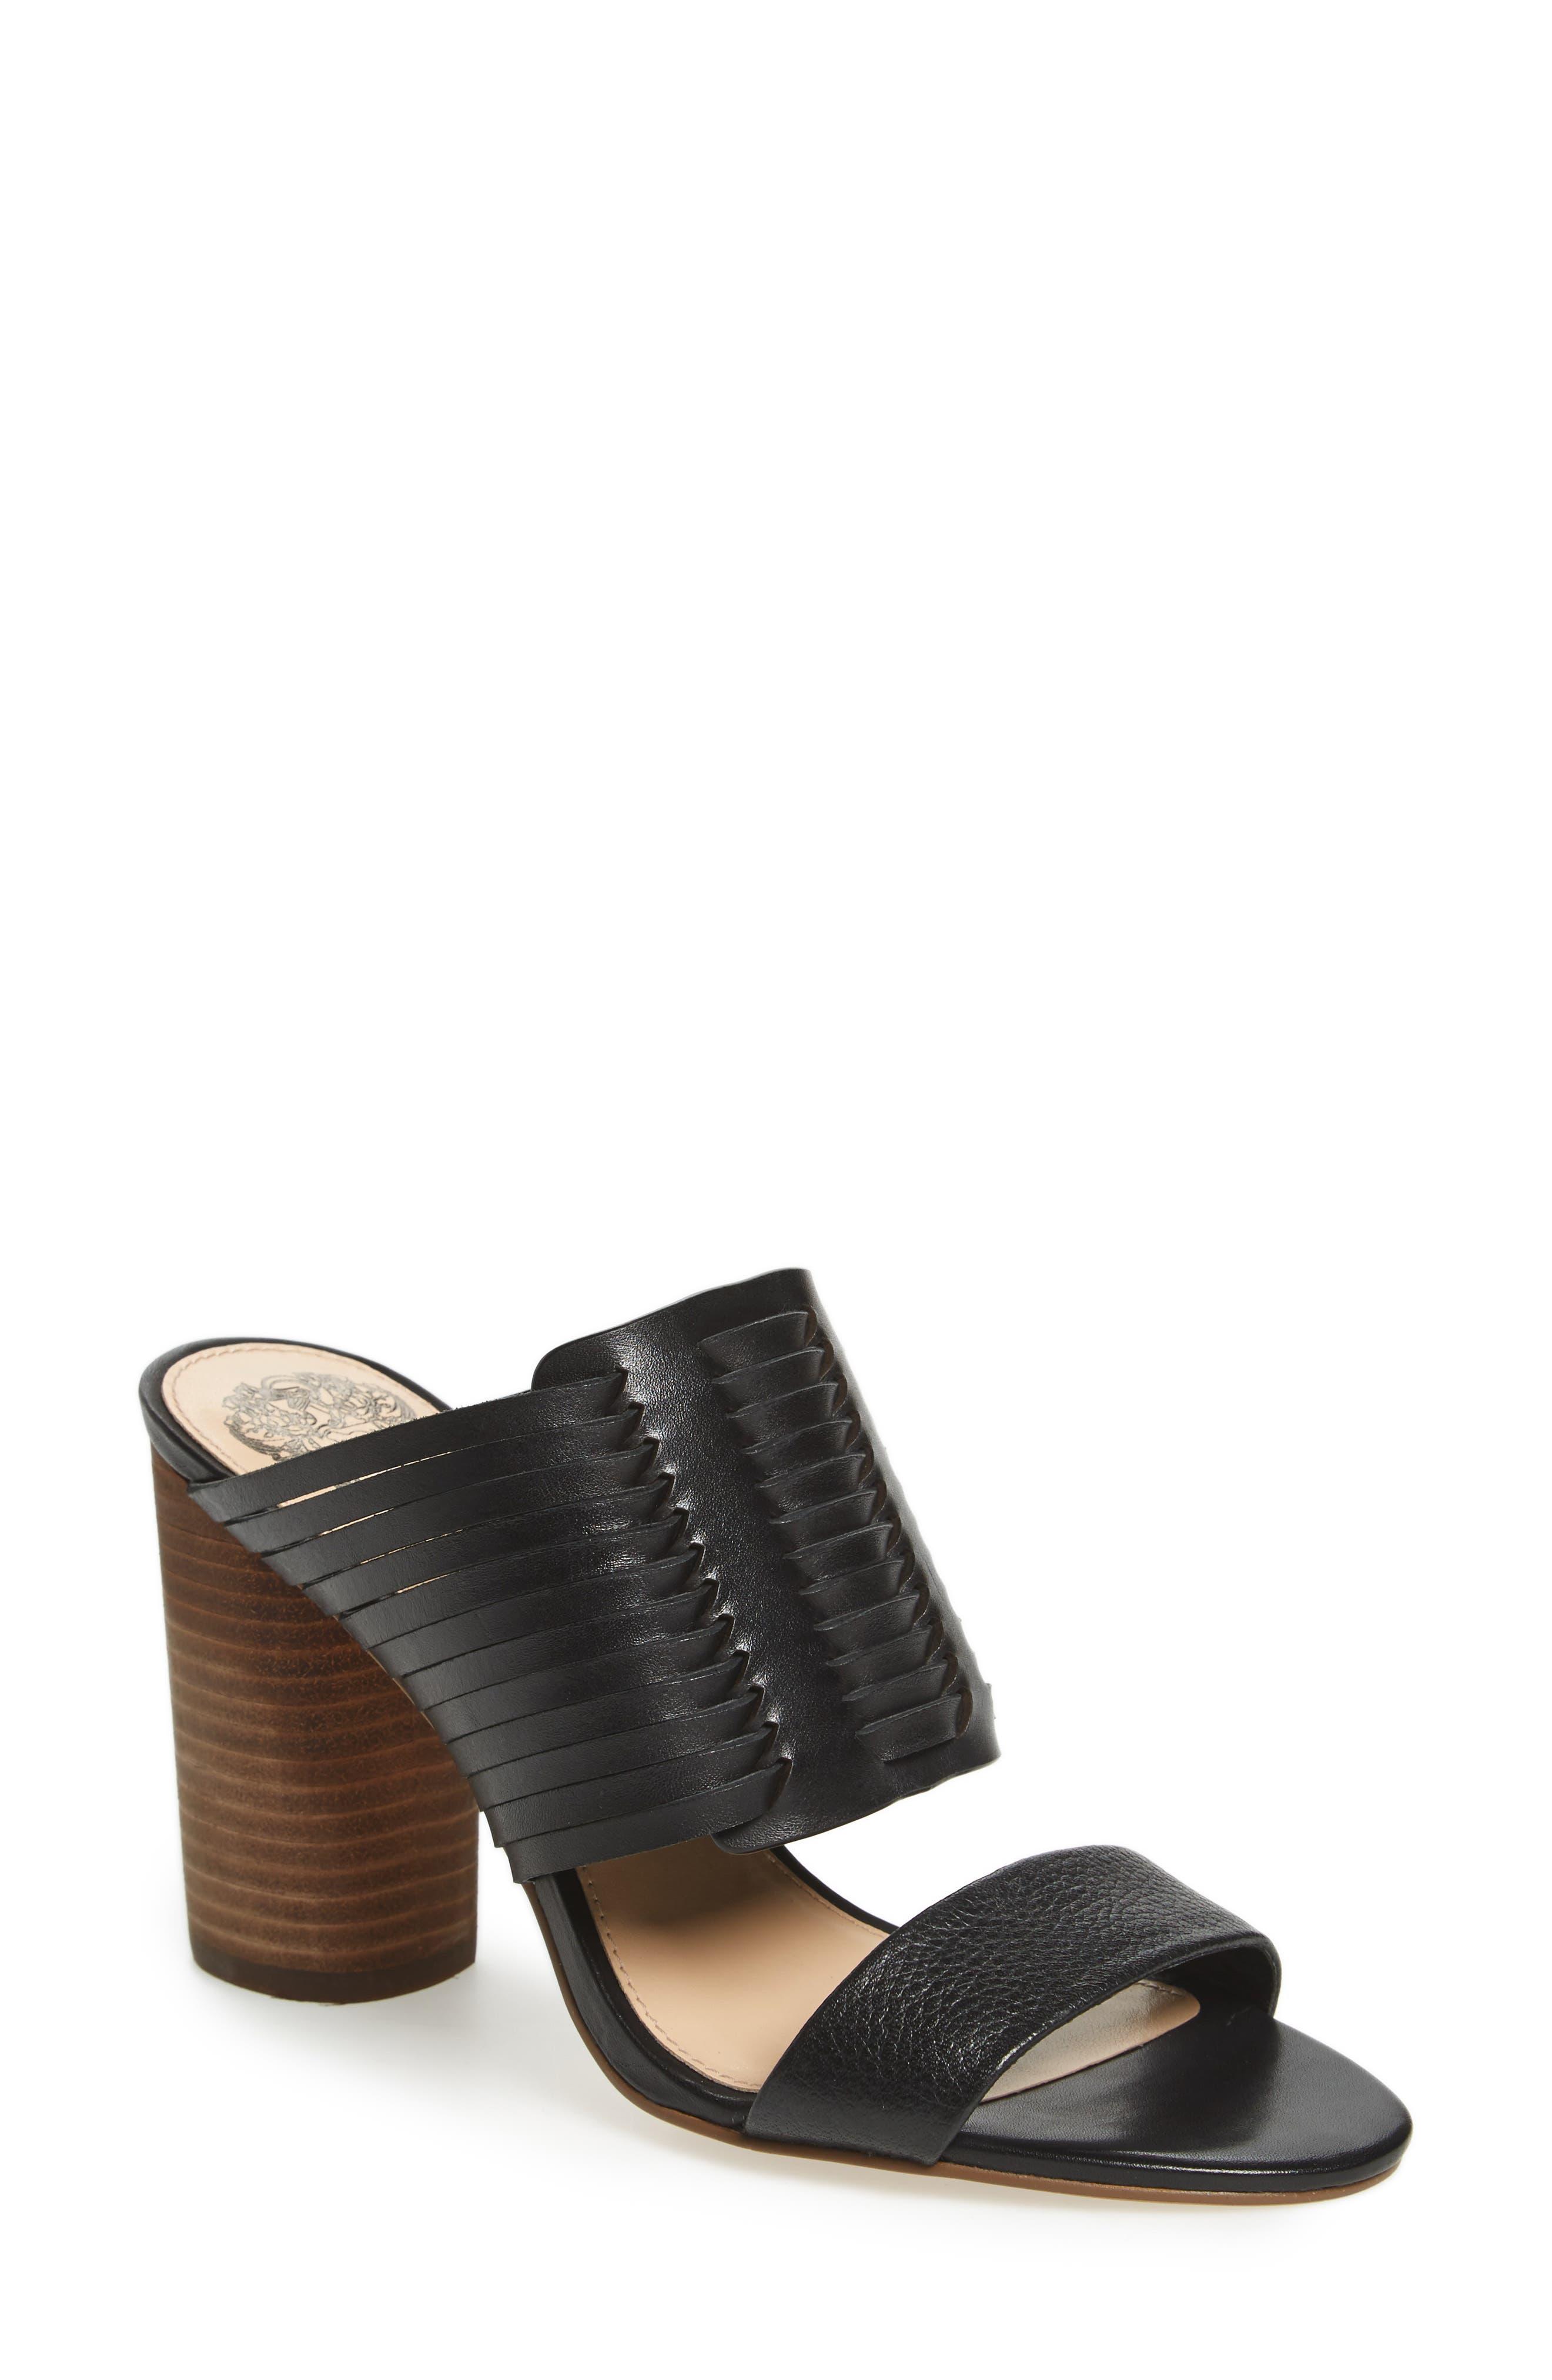 Alternate Image 1 Selected - Vince Camuto Astar Backless Sandal (Women)